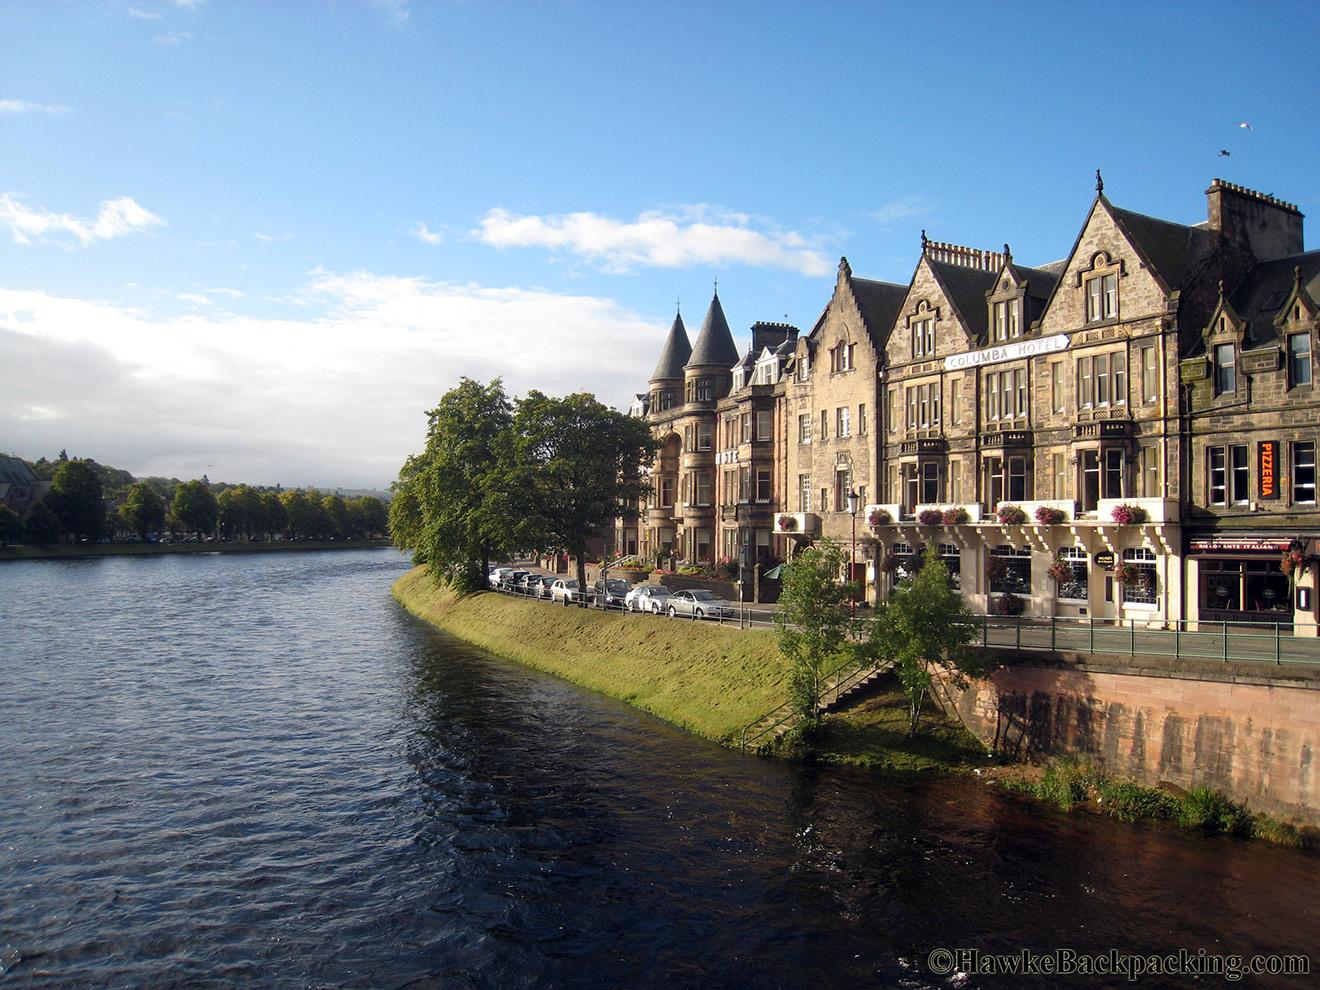 Inverness - HawkeBackpacking.com